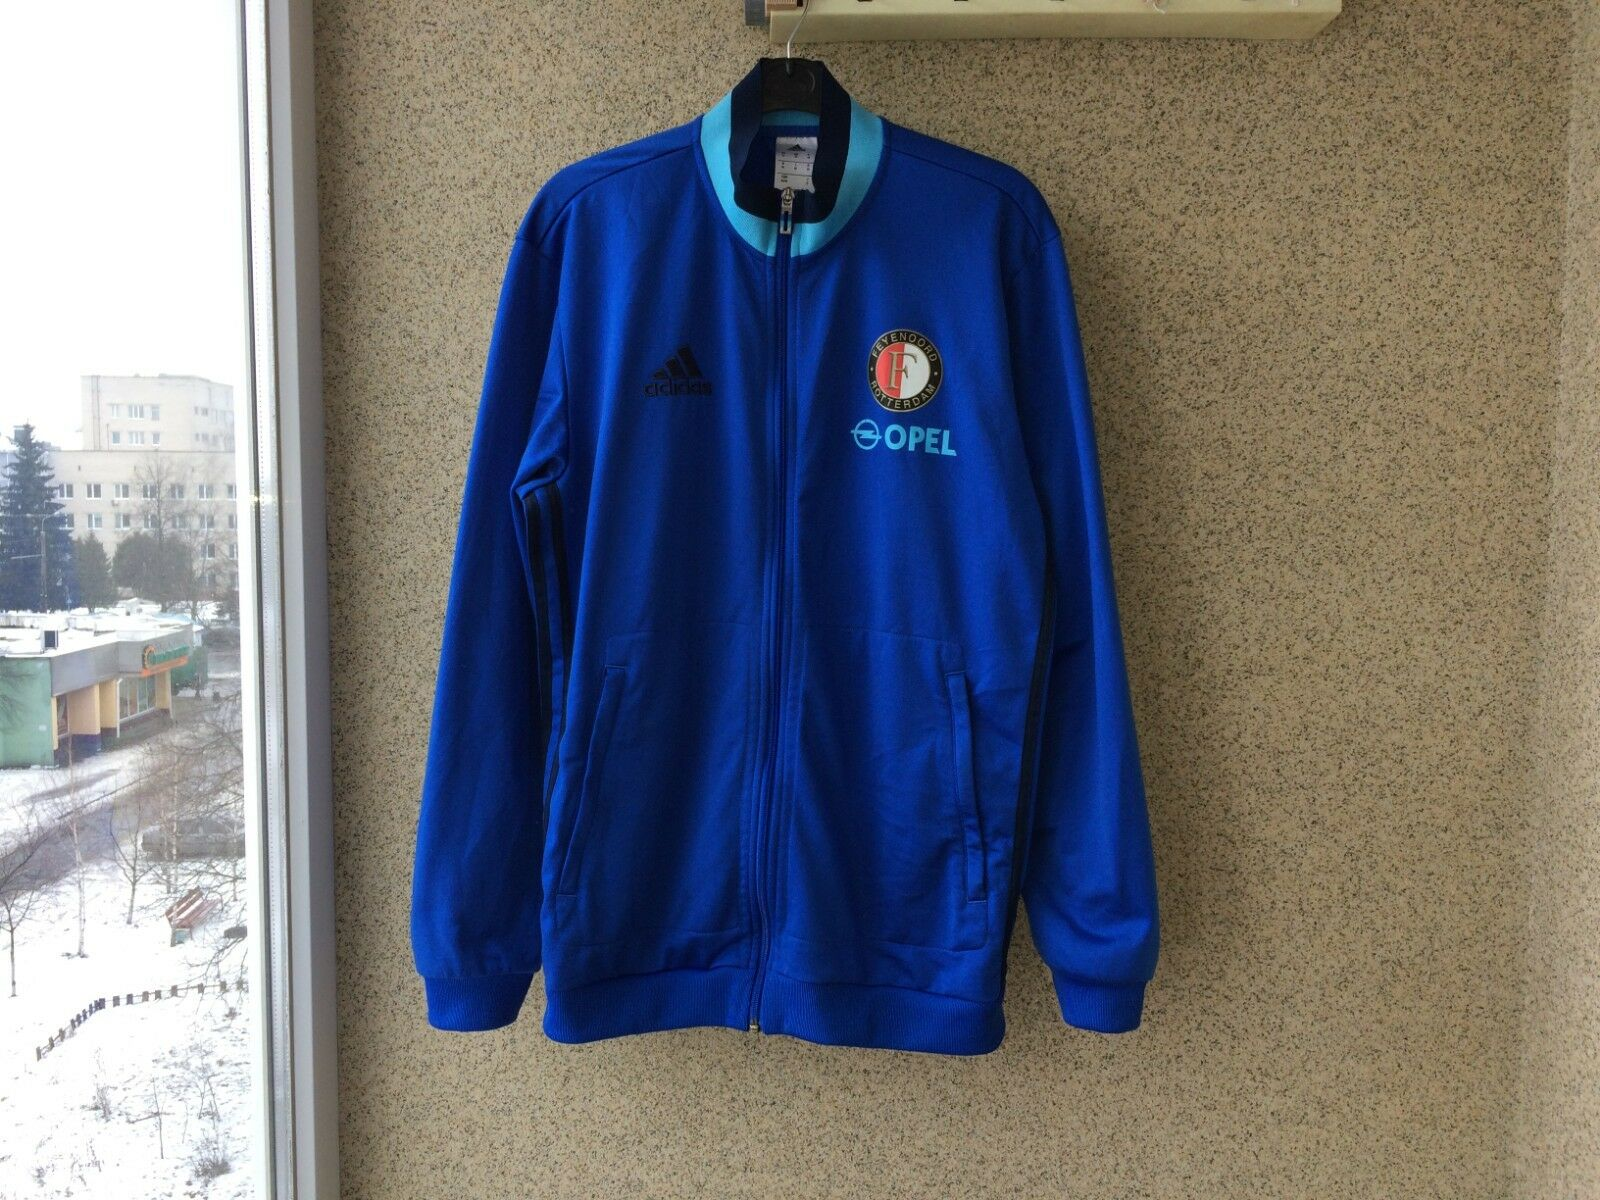 Chaqueta de fútbol Feyenoord 2015 2016 Adidas Azul M Camiseta de fútbol de Holanda